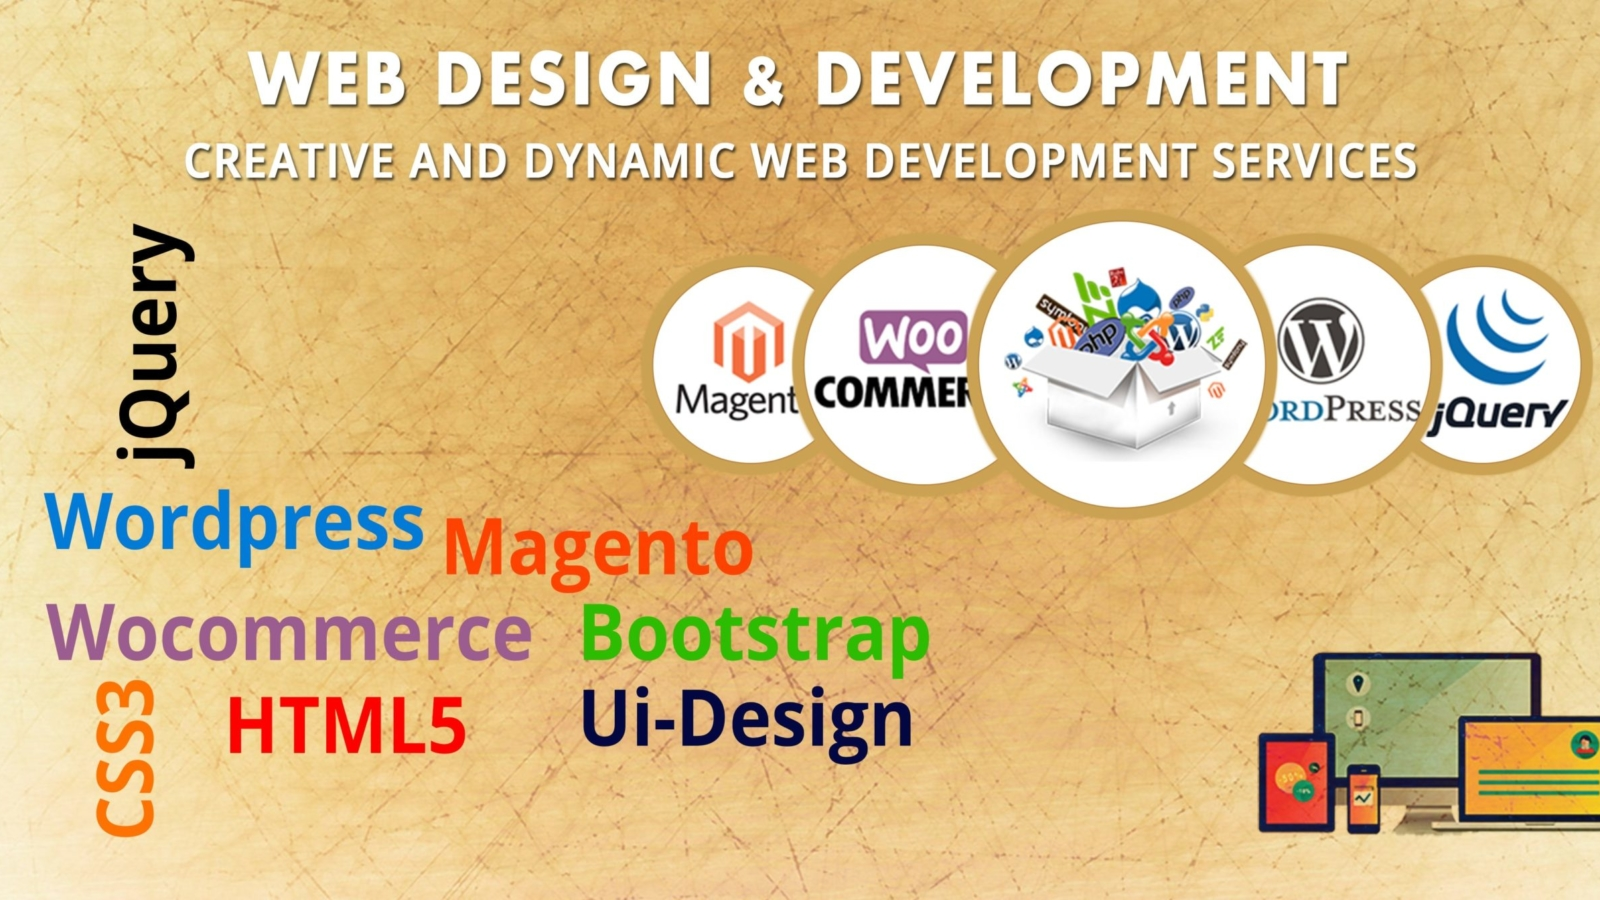 design-development-html-web-1109154